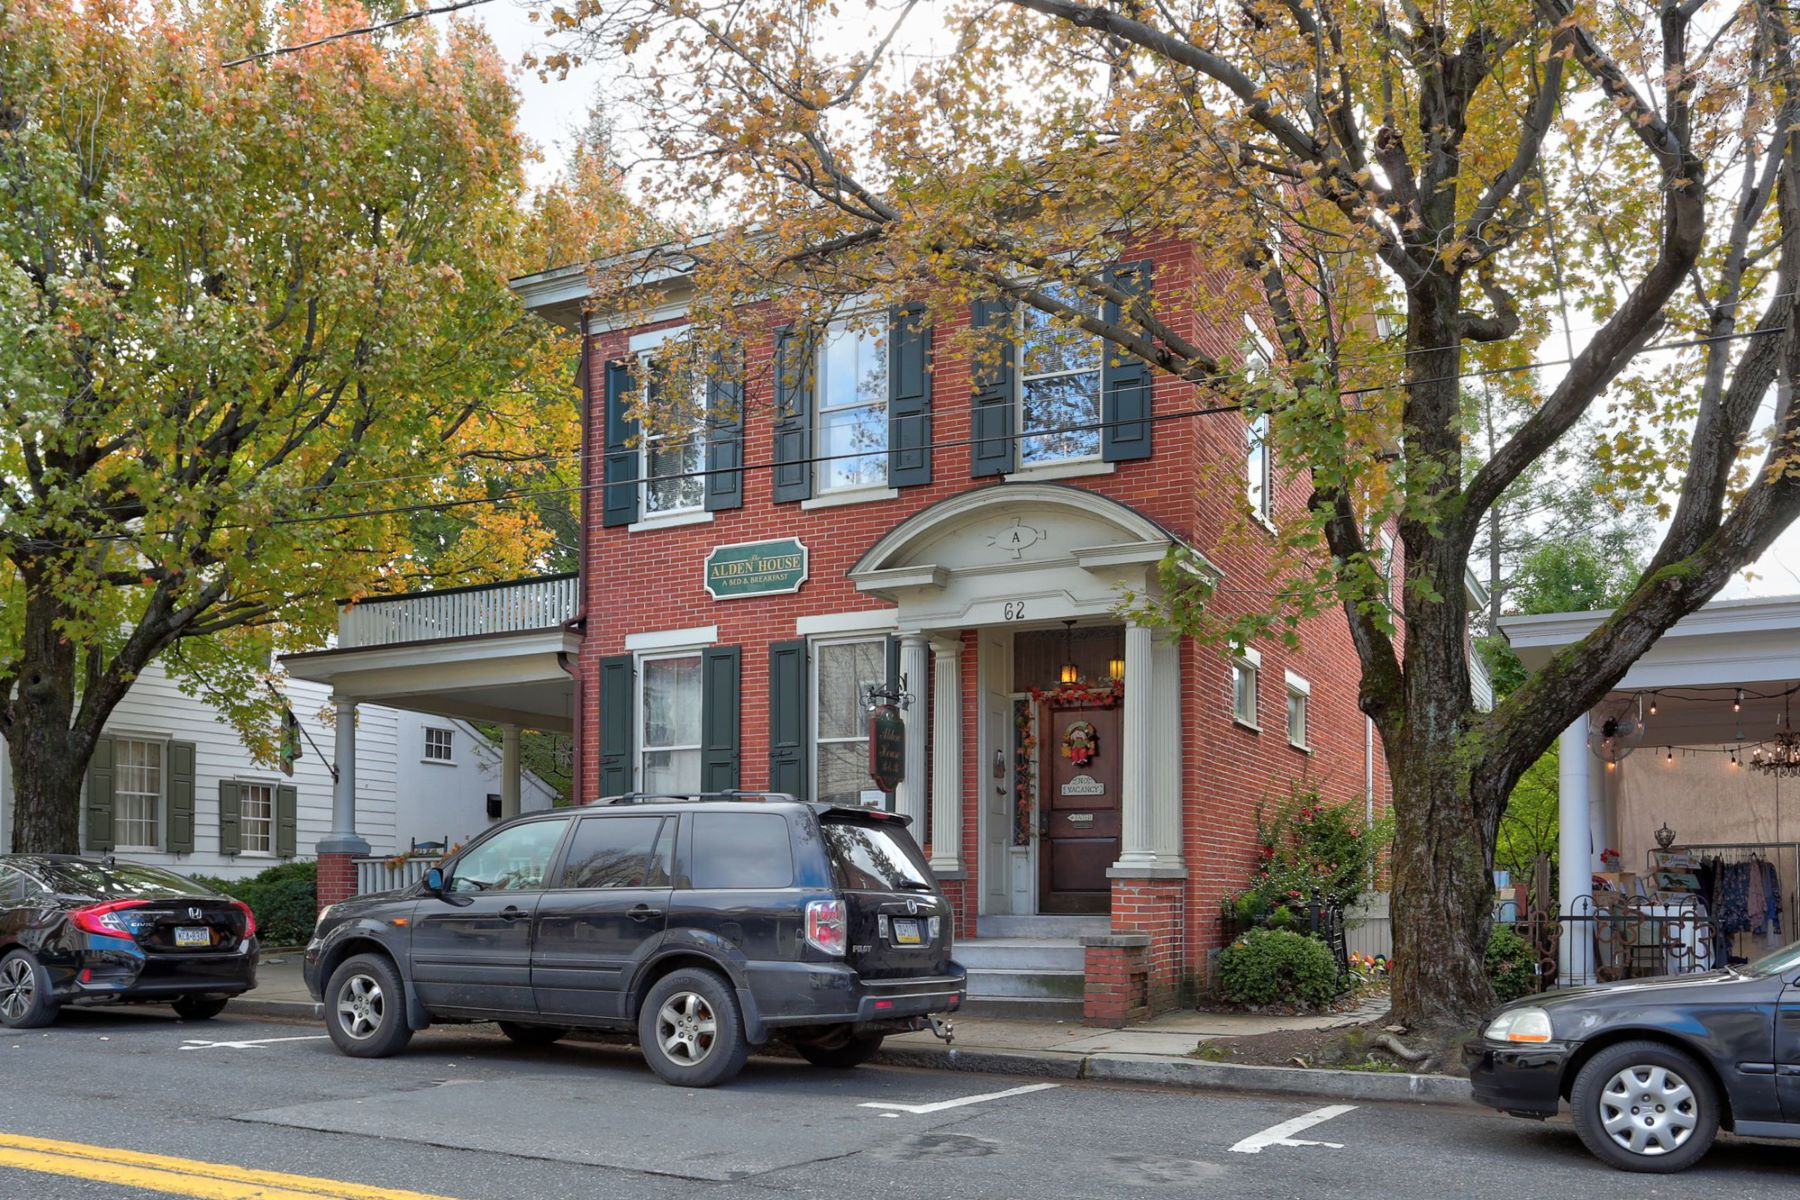 for Sale at 62 E Main Street Lititz, Pennsylvania 17543 United States